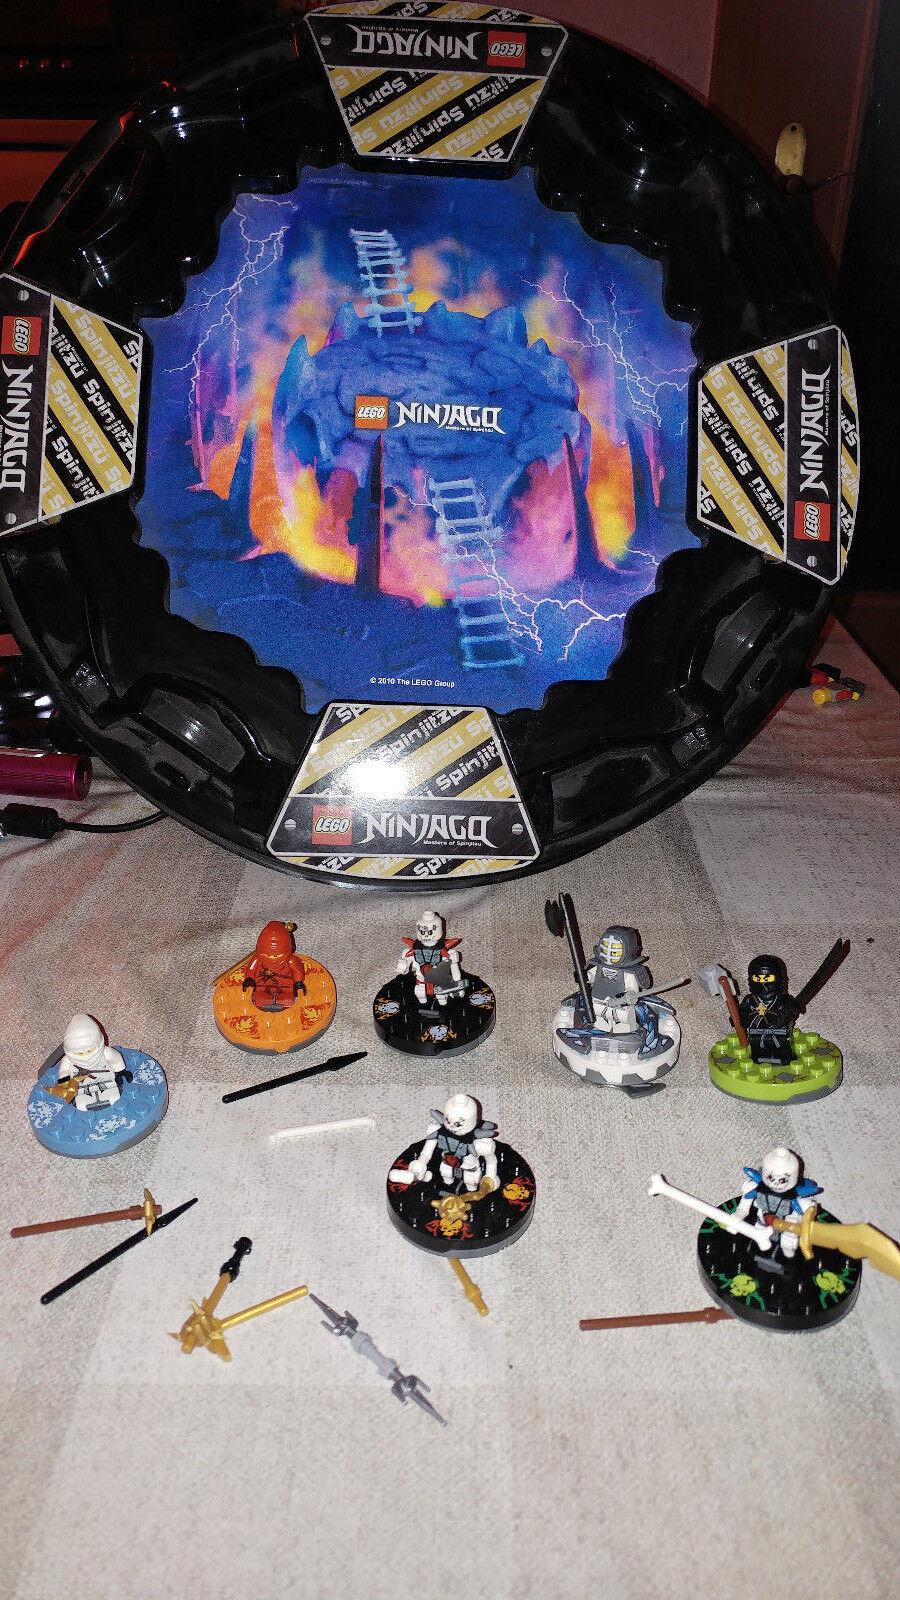 Lego Ninjago seltene Kampfarena mit 7 Ninjagos mit passenden Spinnern RAR